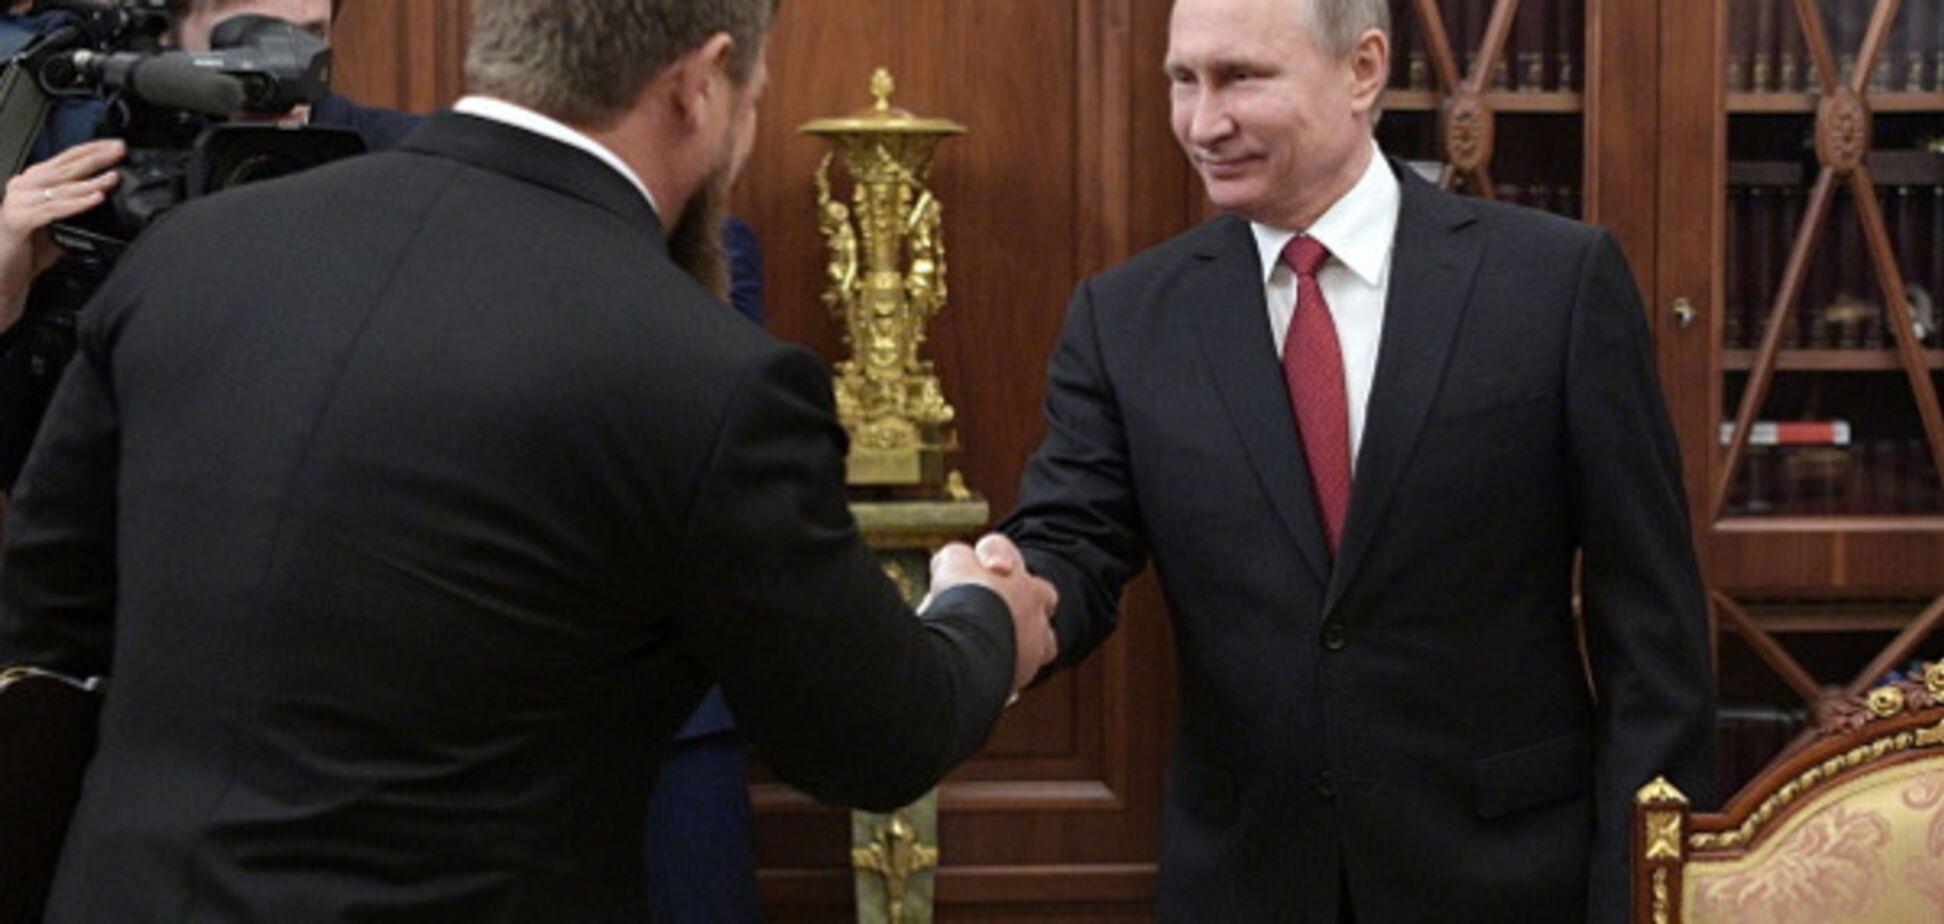 Володимир Путін, Рамзан Кадиров